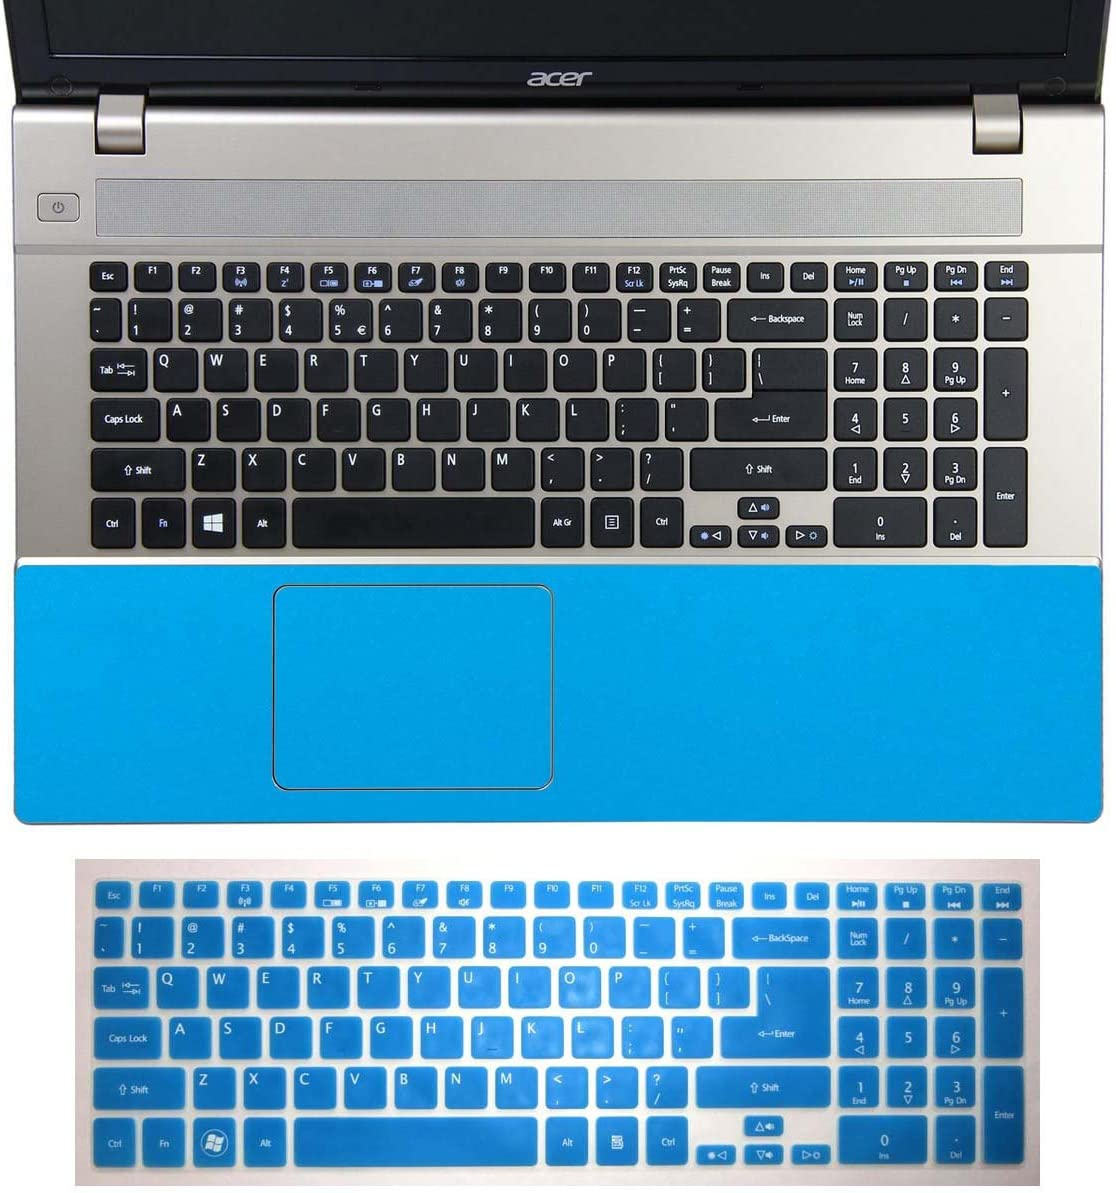 2in1 Half Wrist Palmrest Skin Sticker With Trackpad Touchpad Cover+ Keyboard Protector for 17.3'' Acer Aspire V3-772, V3-772G (shimmery light blue half palmrest sticker+semi-blue keyboard skin)